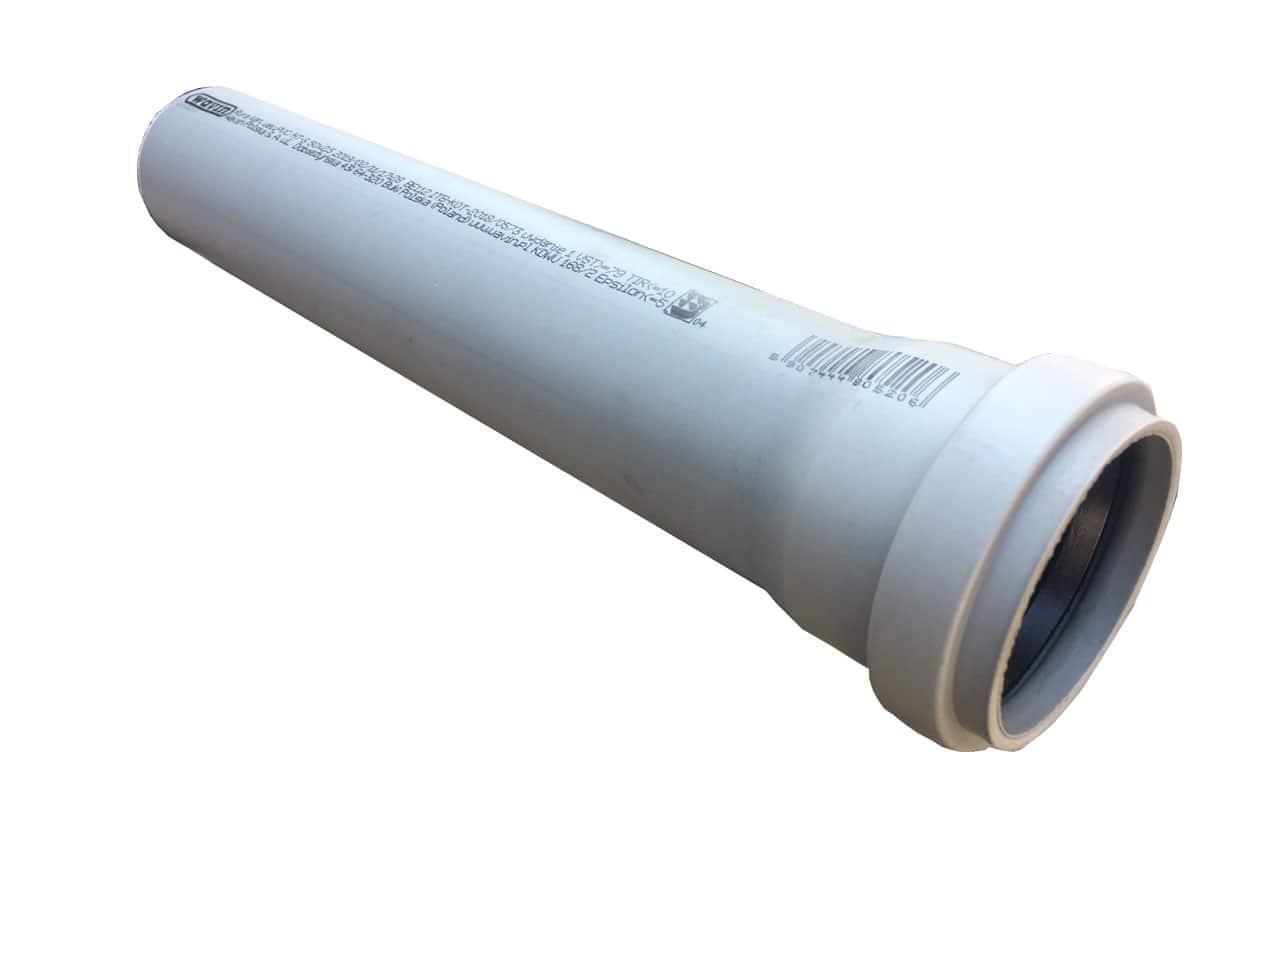 Труба для внутренней канализации 50*0.5 wavin